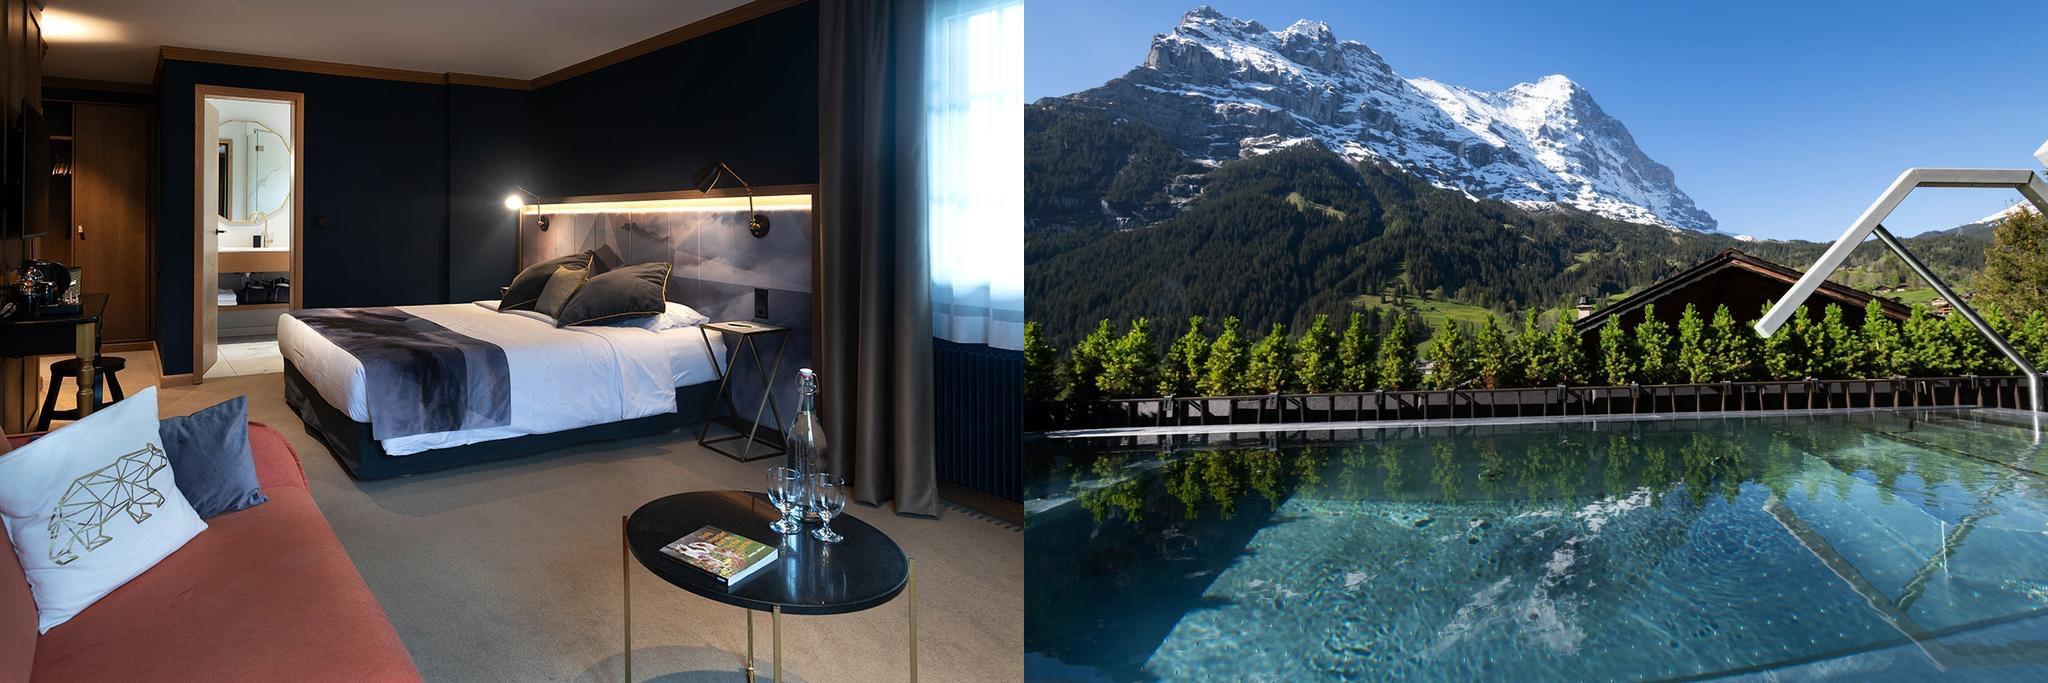 Boutique Hotel Glacier, 冰川精品酒店, 格林德瓦飯店, 瑞士飯店, Grindelwald Hotel